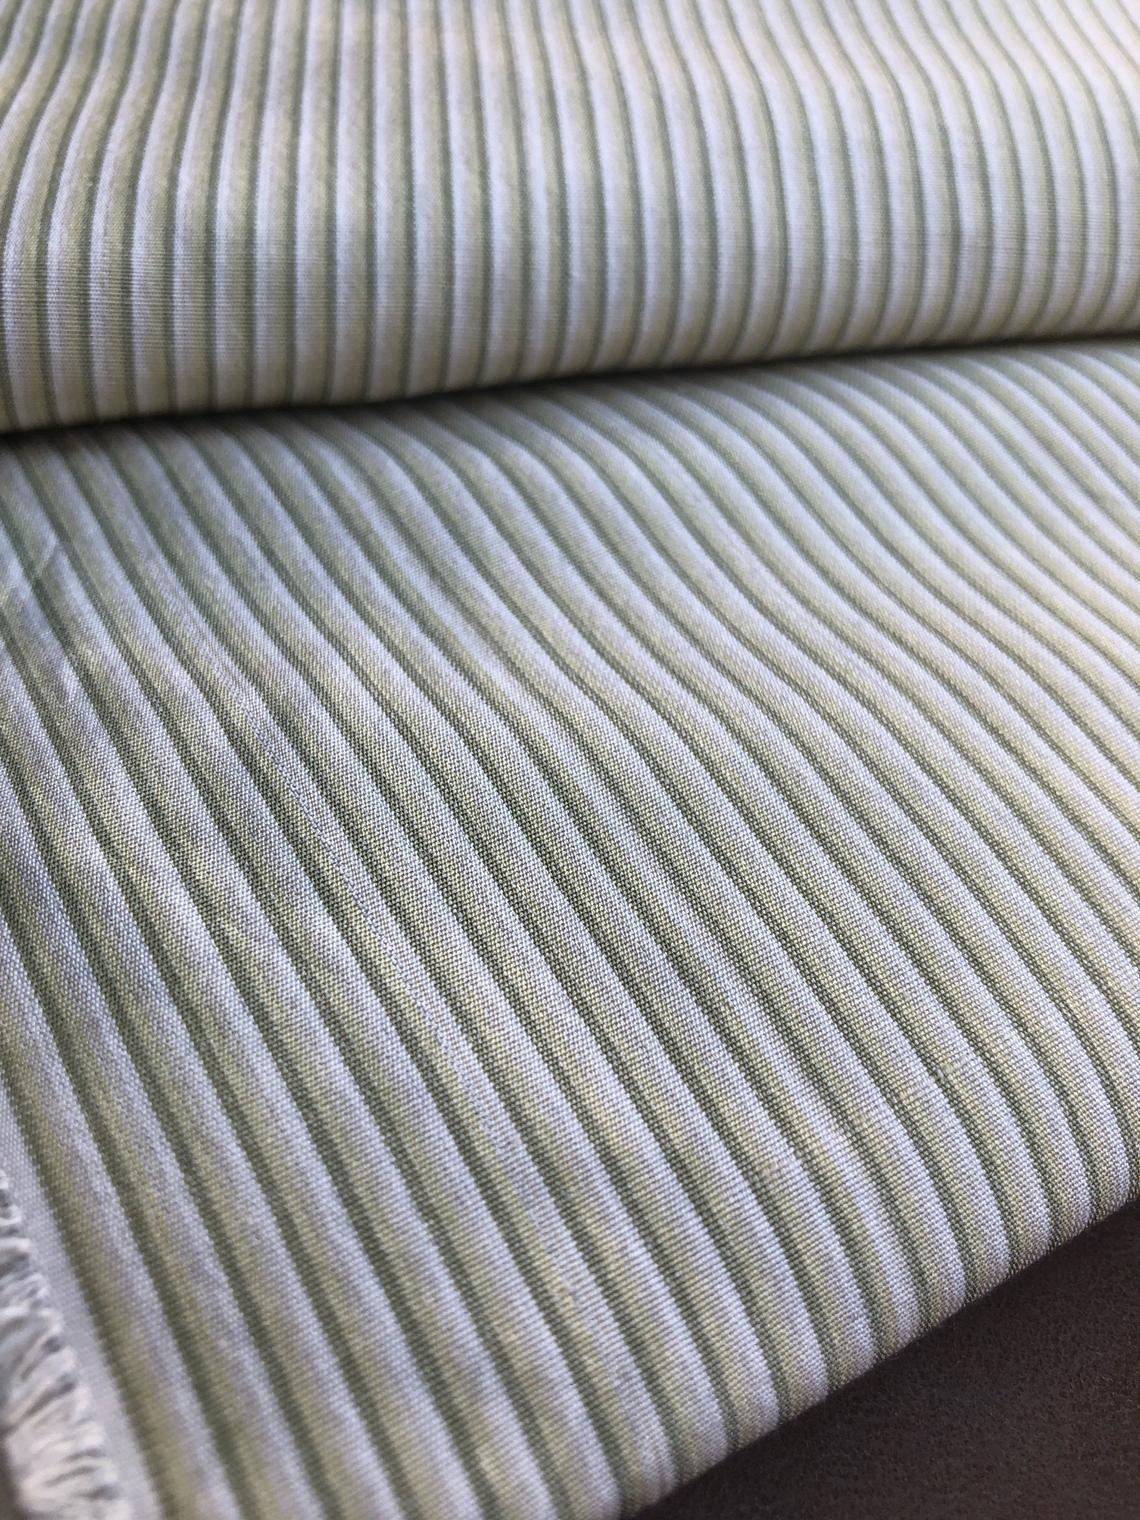 Precut 7 Yards 60 Wide Striped Pattern 100 Silk Green White Medium Weight Woven Fabricask A Question With Images Woven Fabric Green White Woven